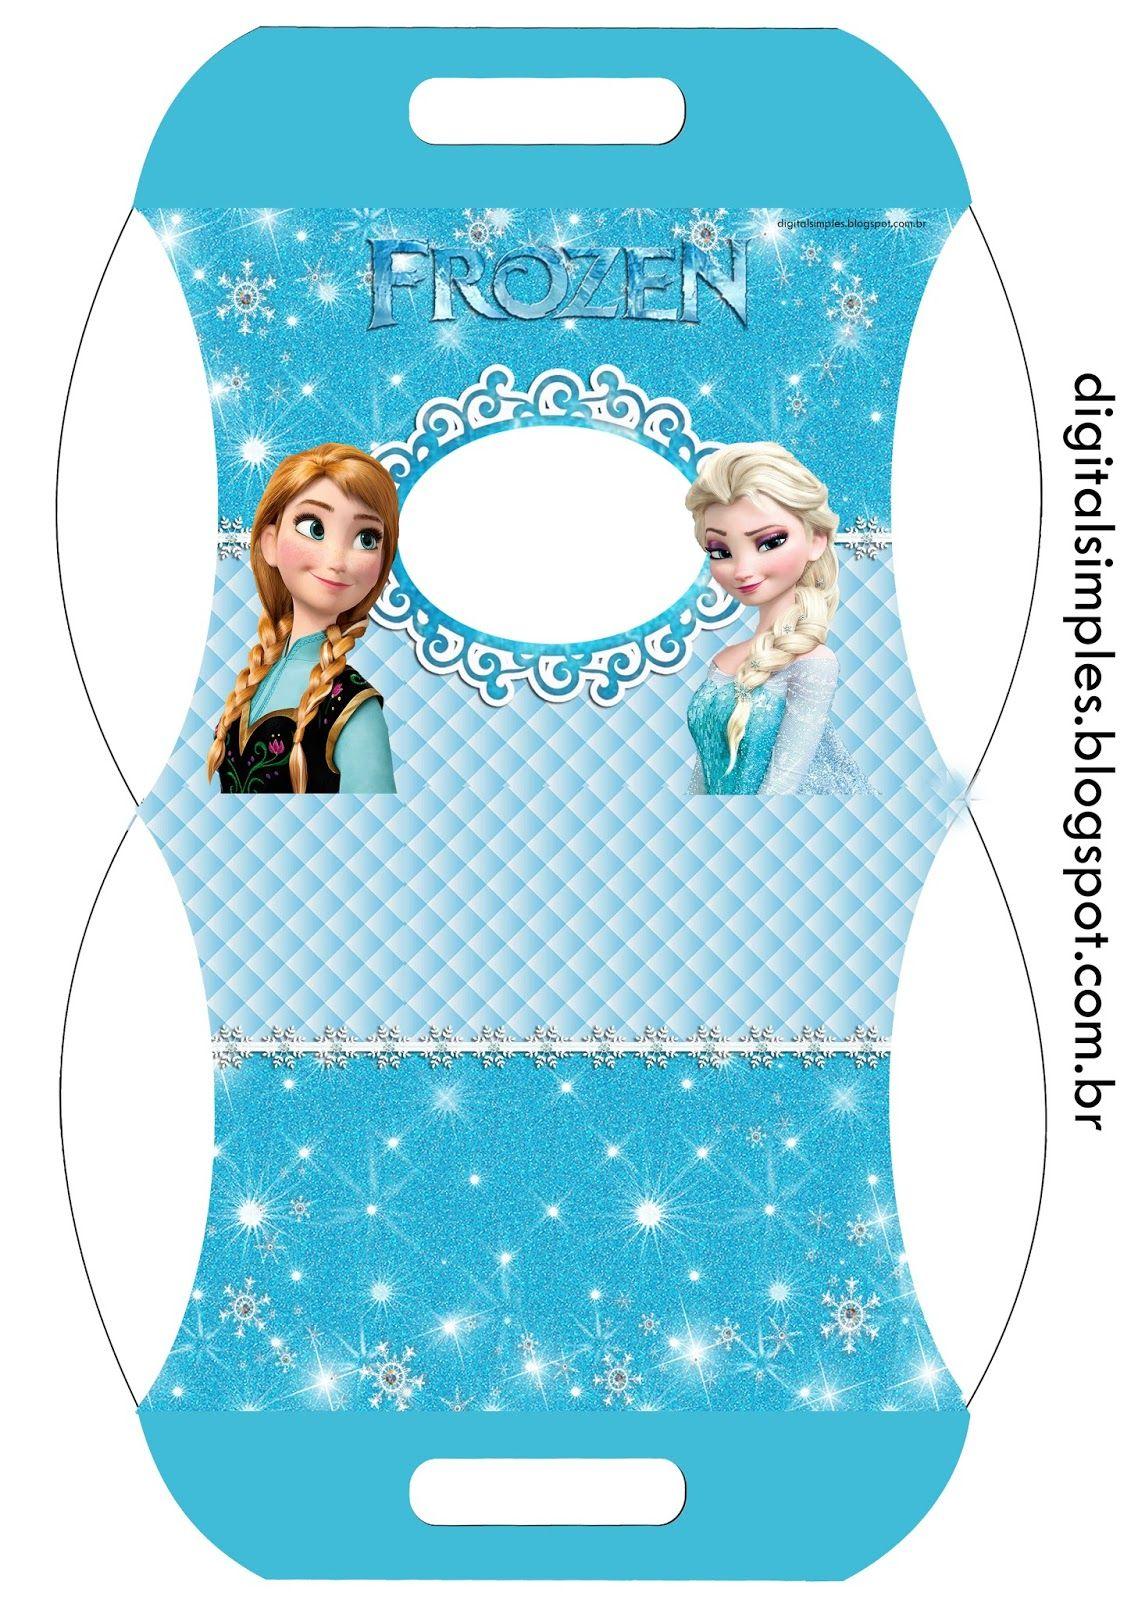 Festa Tema Frozen para Imprimir Grátis - Convites Digitais Simples